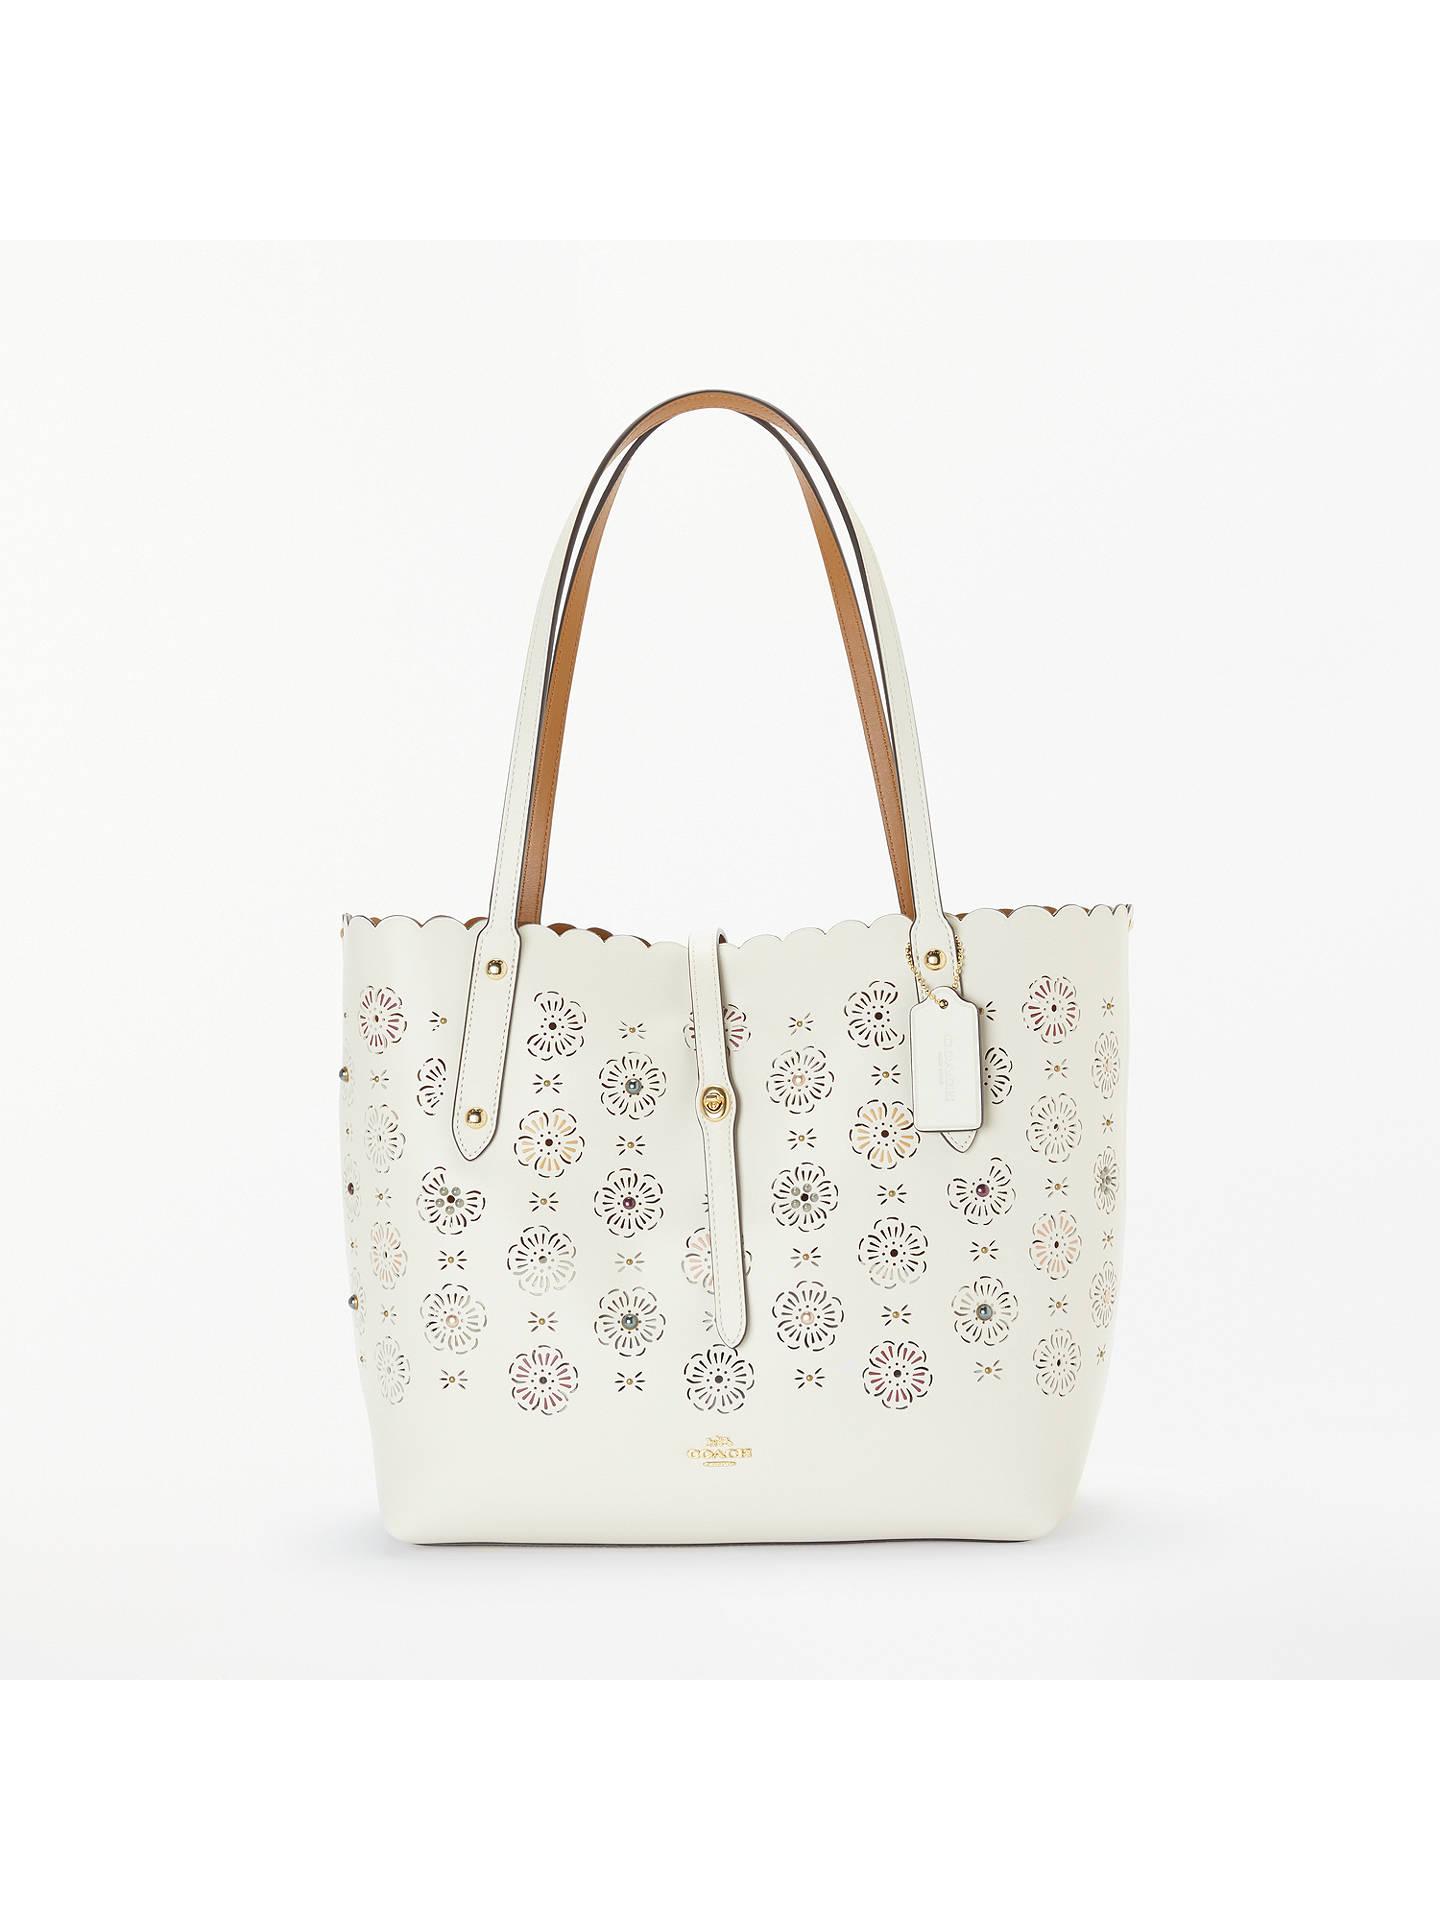 e924880ad2 Buy Coach Market Floral Cut Leather Tote Bag